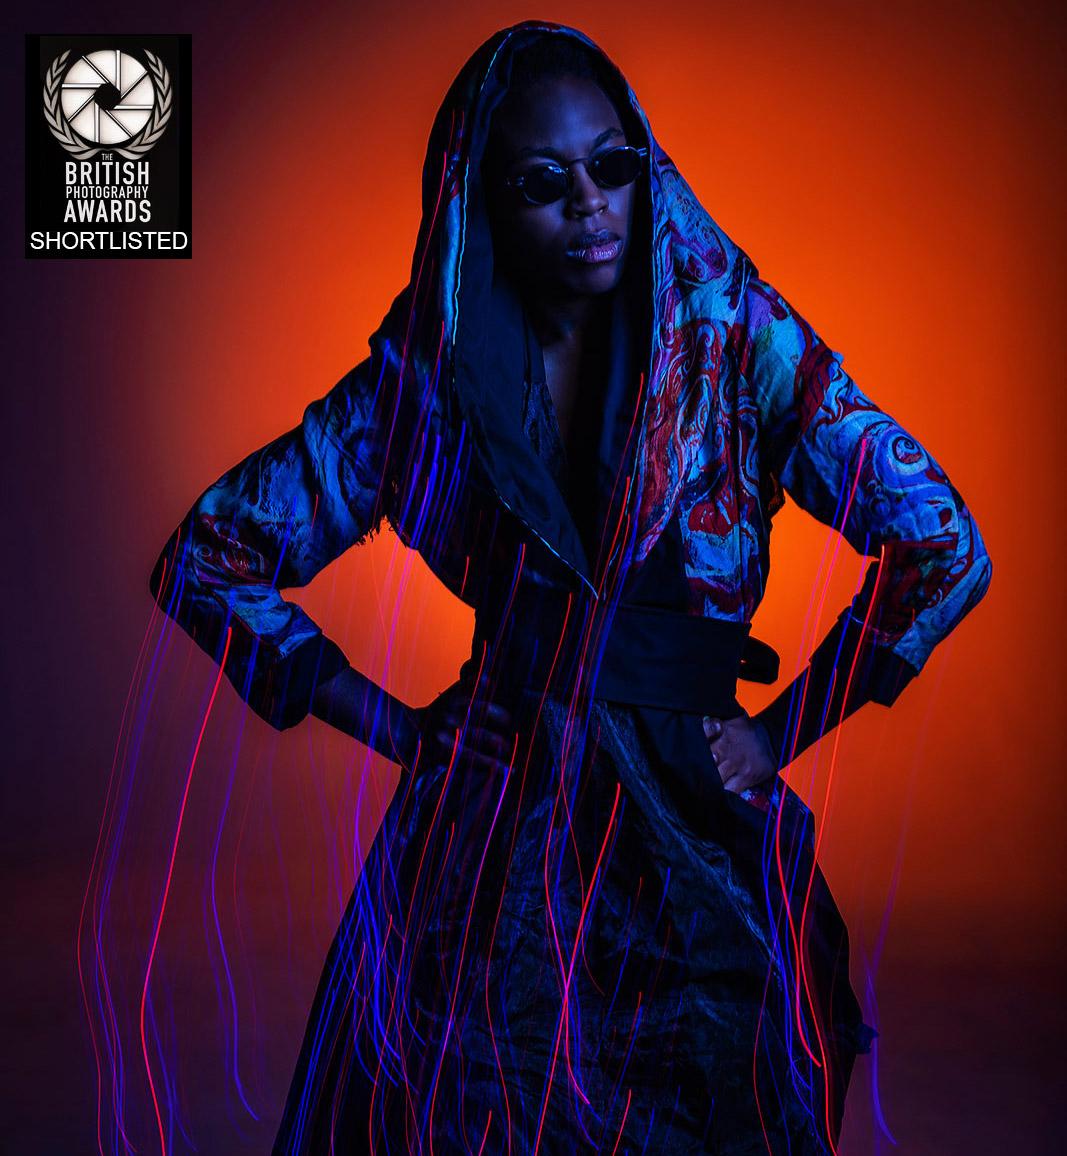 Fashion photographer birmingham, Model Christina Mcintosh wearing Disorder clothes by Paul Ward